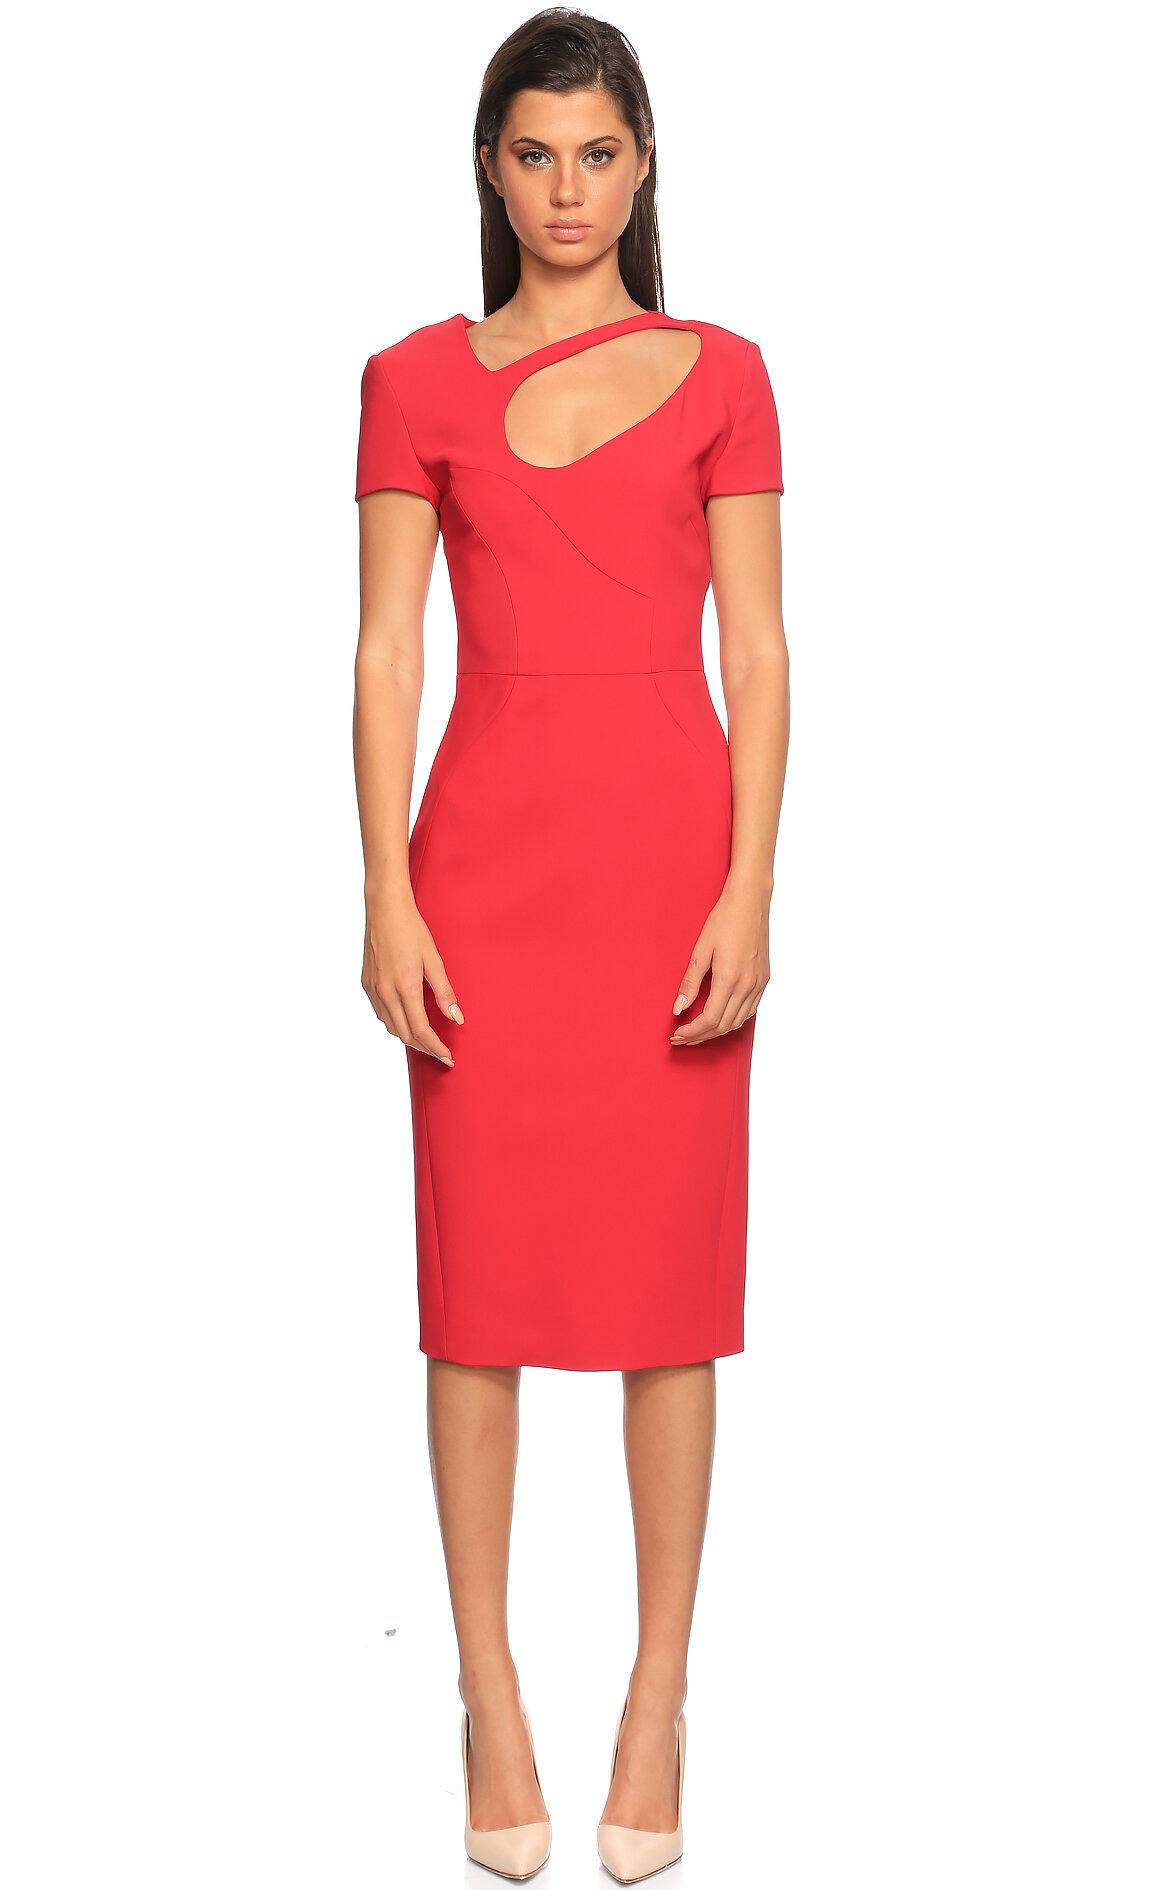 Antonio Berardi  Kırmızı Elbise